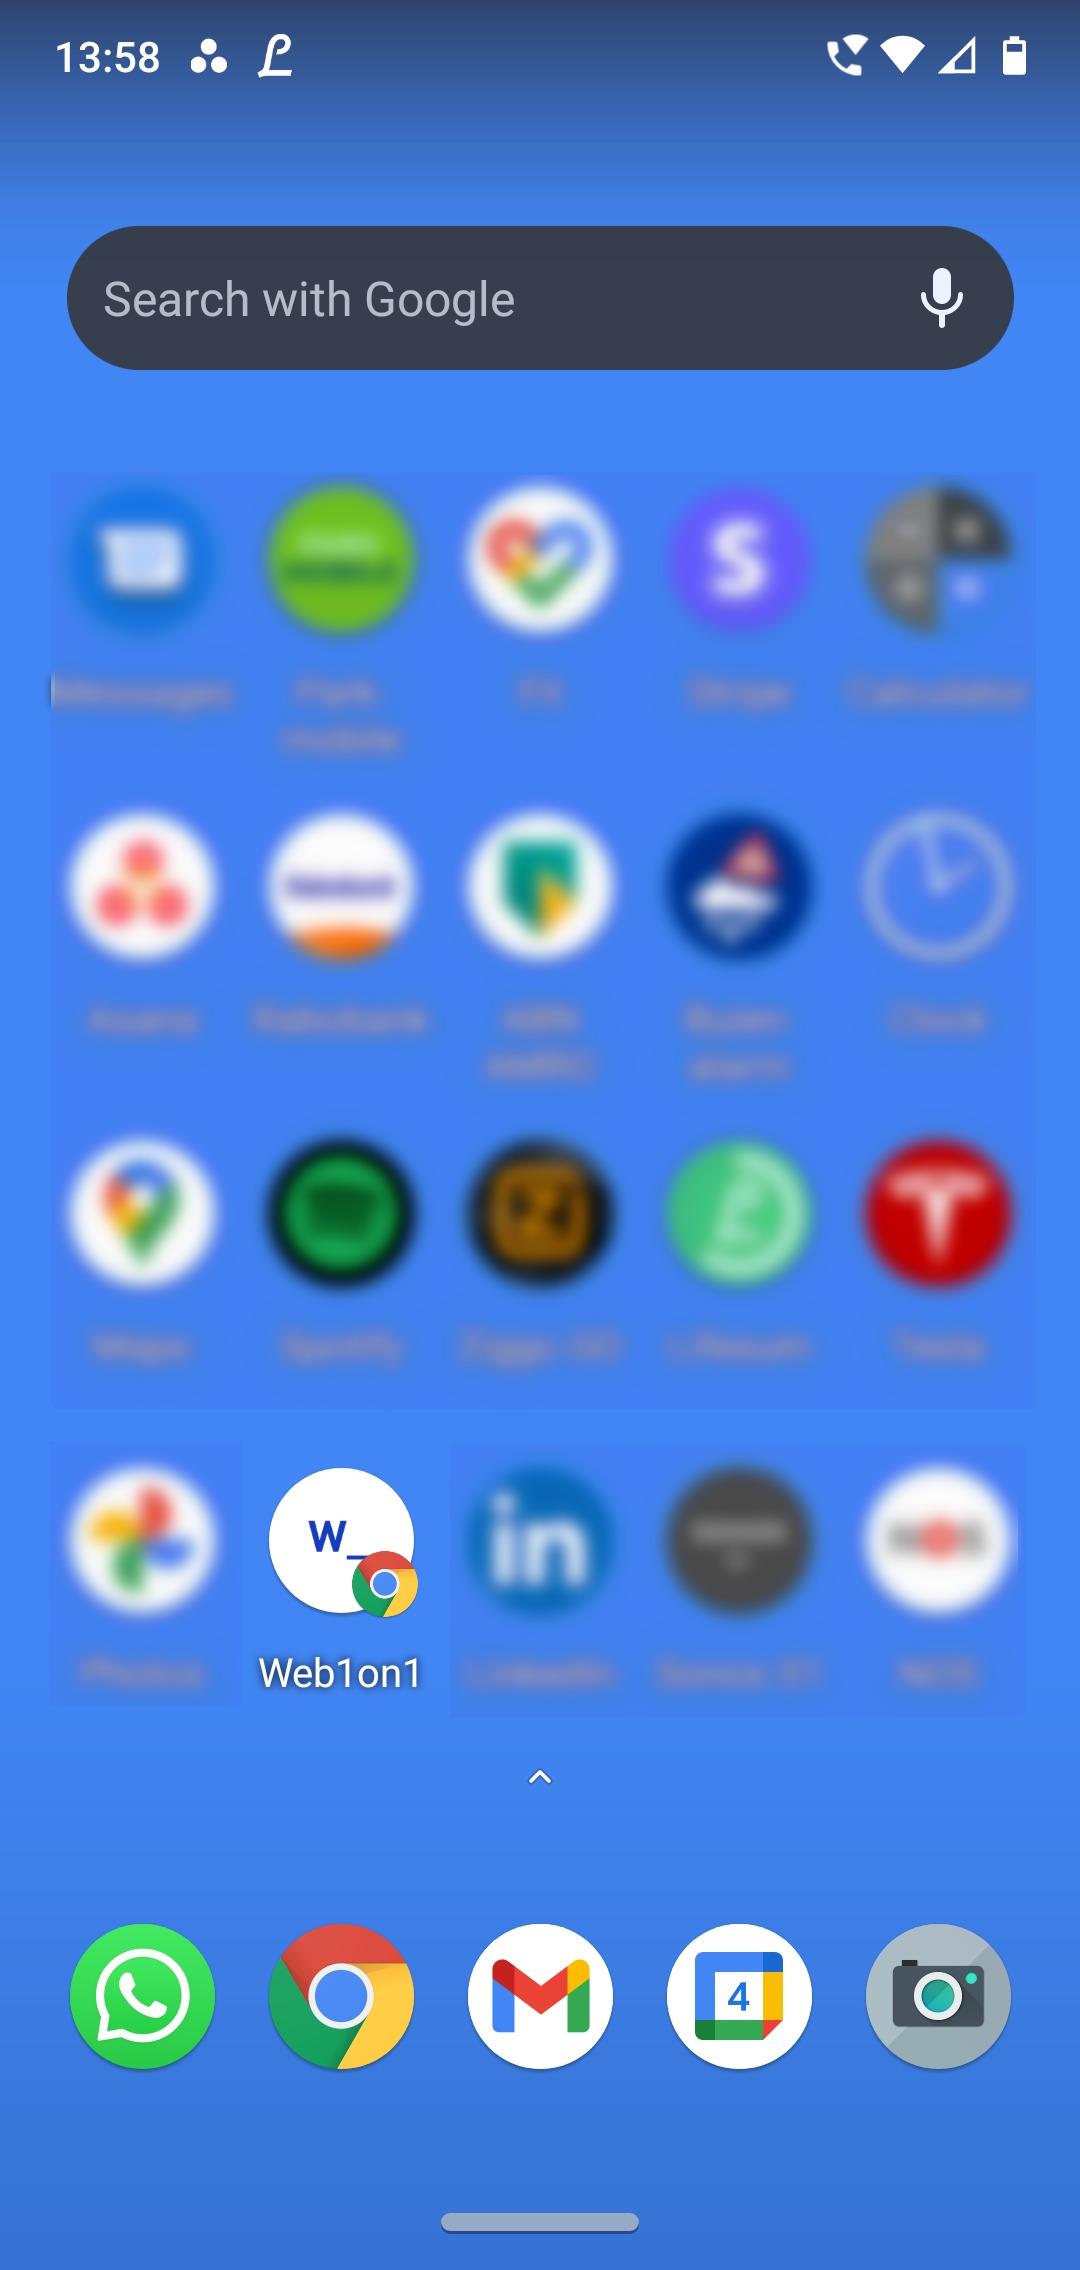 Web1on1 Mobile App